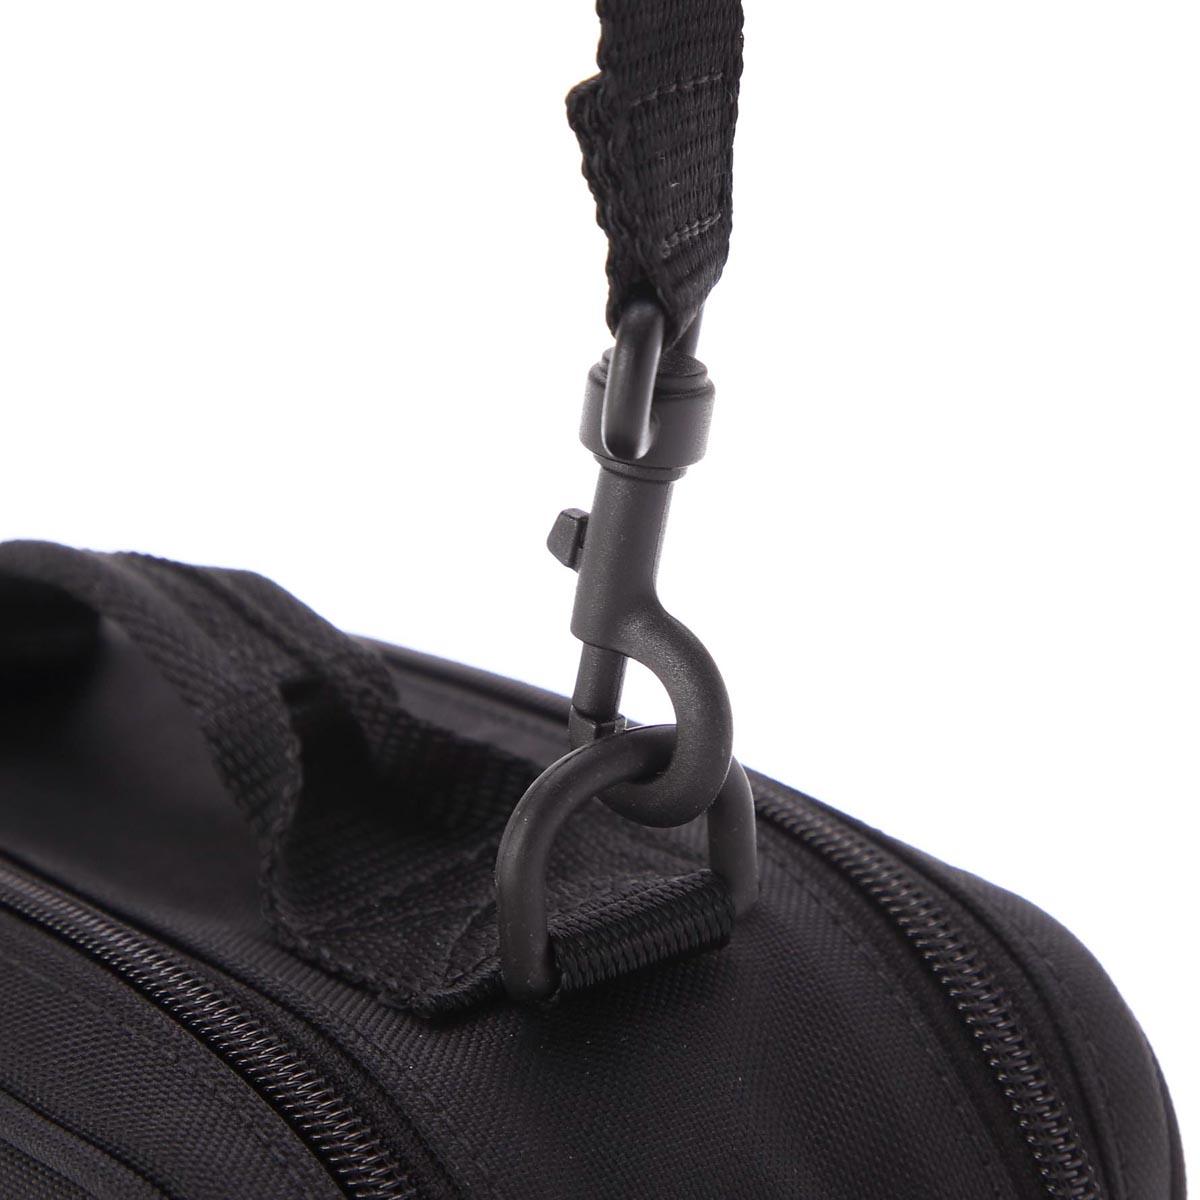 BALENCIAGA バレンシアガ カメラバッグ/ARMY CAMERA BAG S メンズ